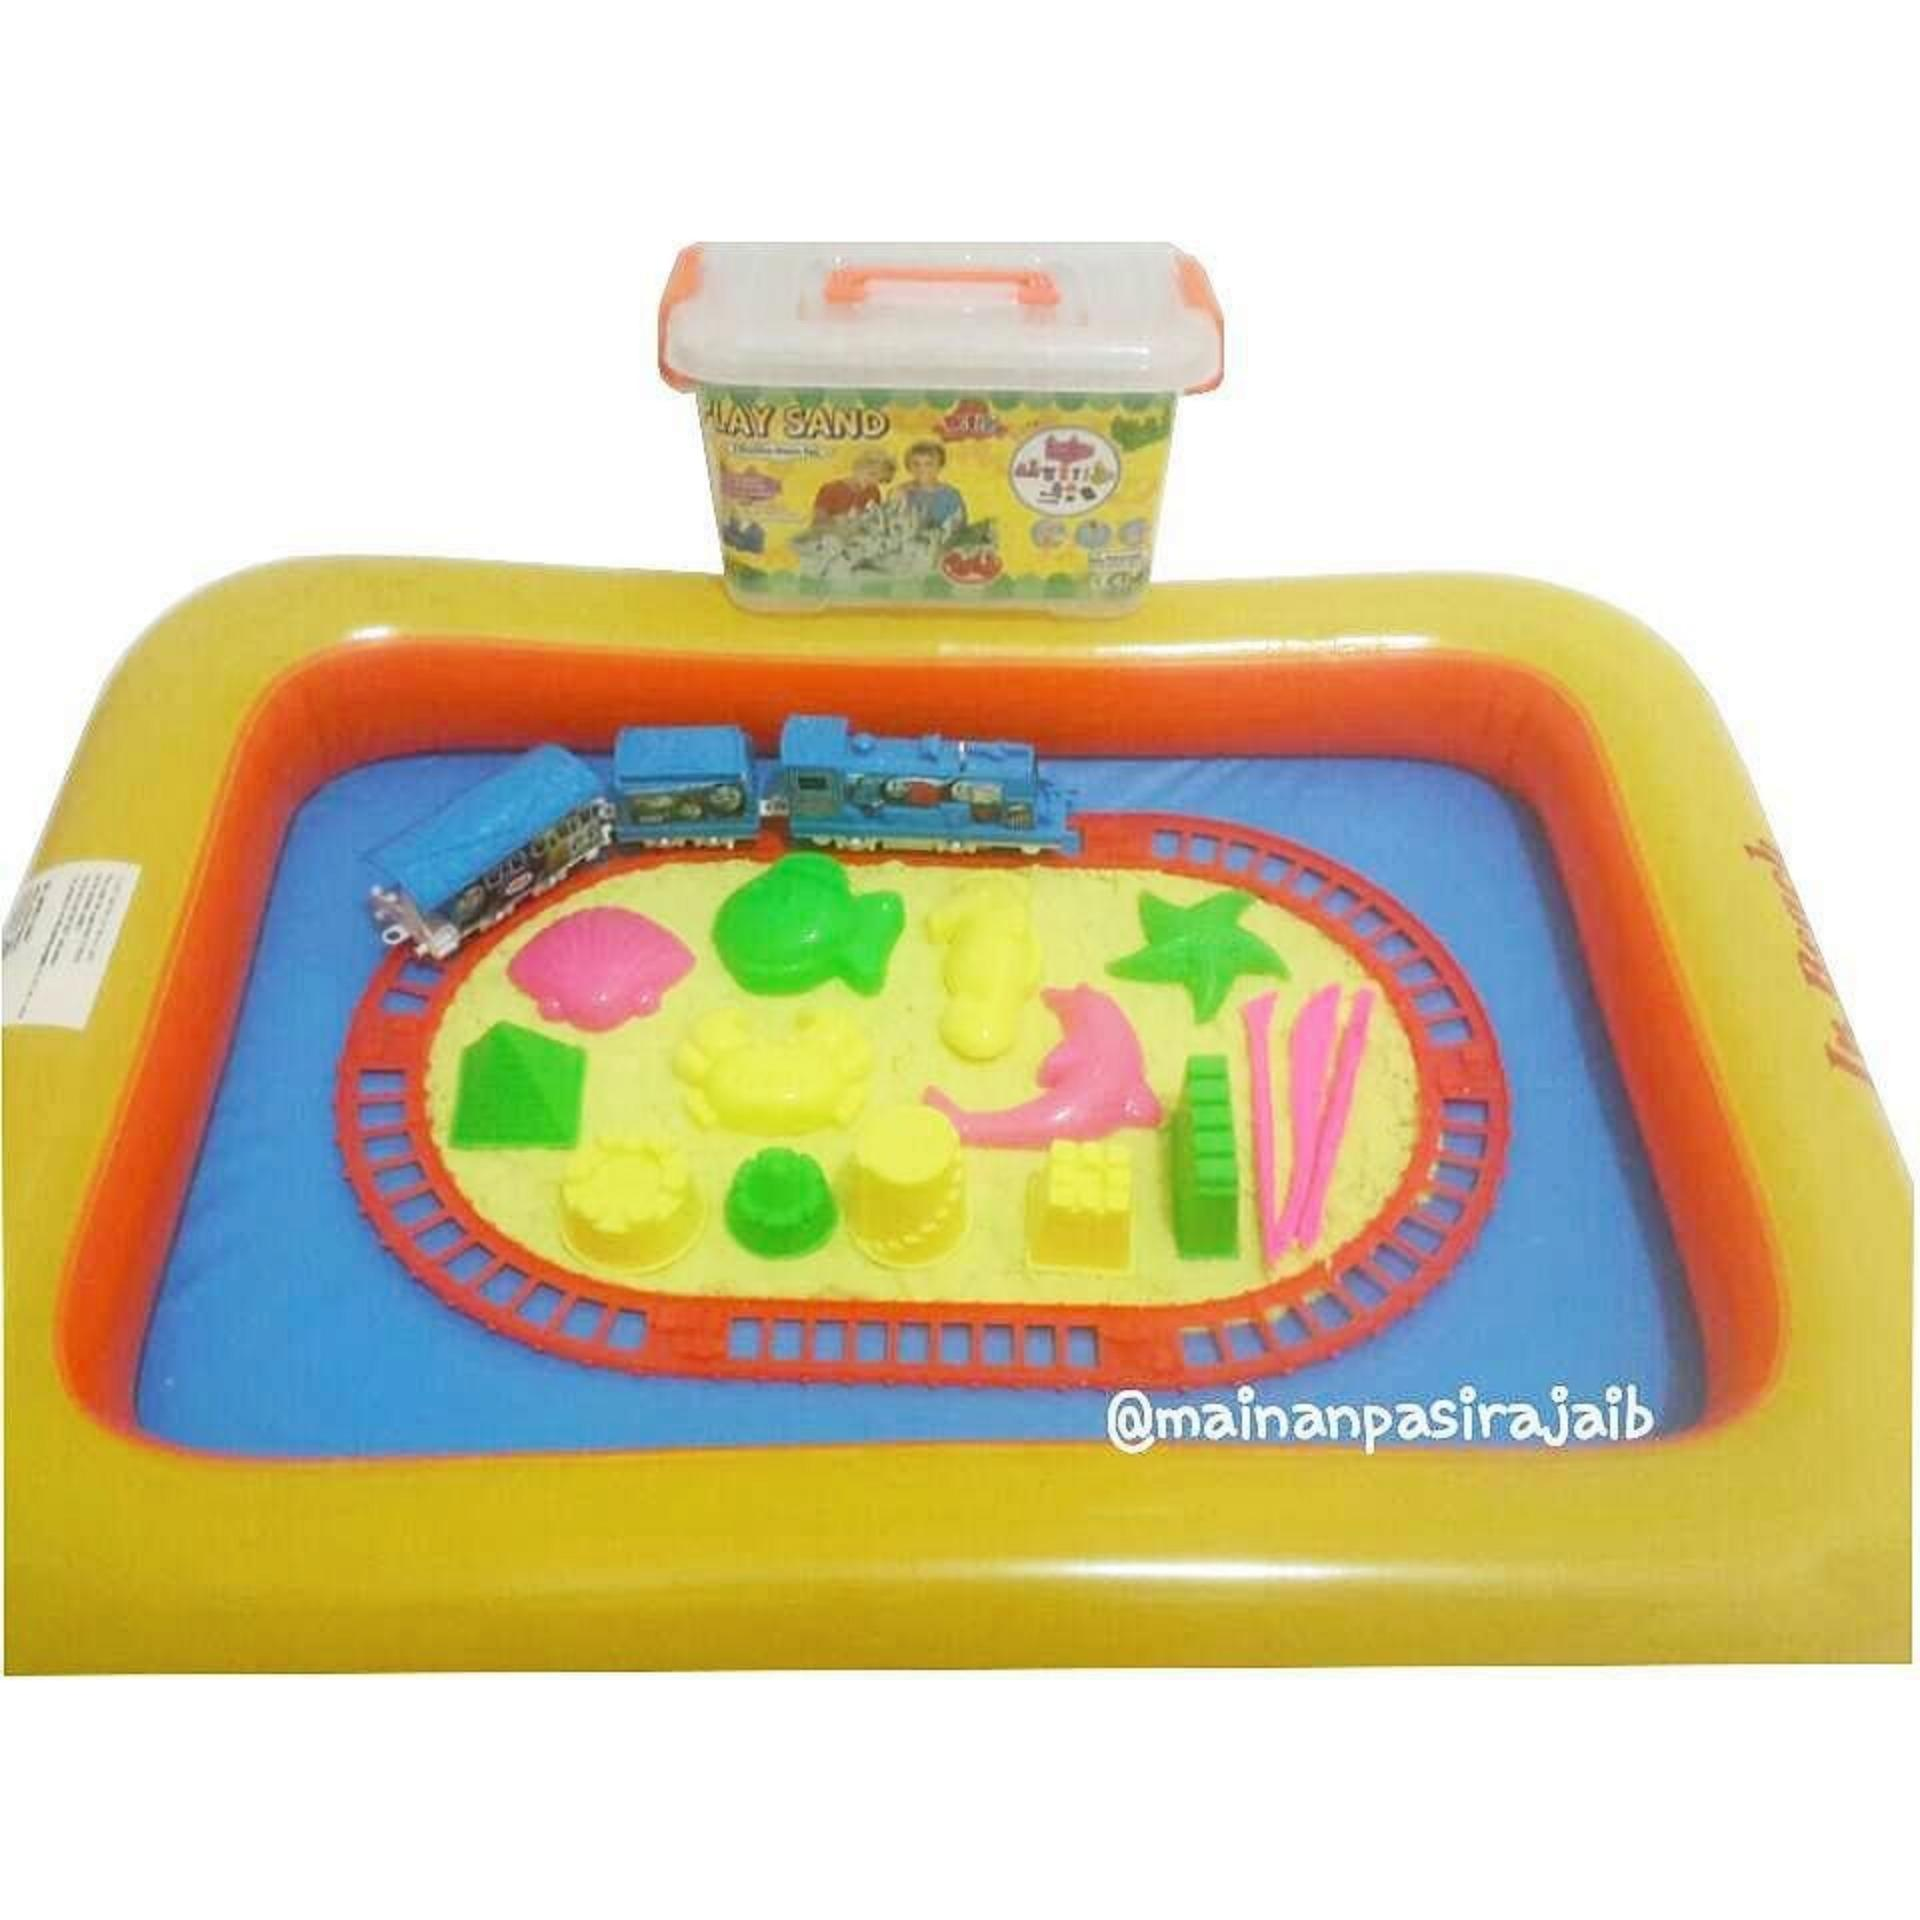 Mainan Edukatif Pasir Ajaib Paket Play Sand 1Kg Dengan Mainan Train Playset Thomas Indonesia Diskon